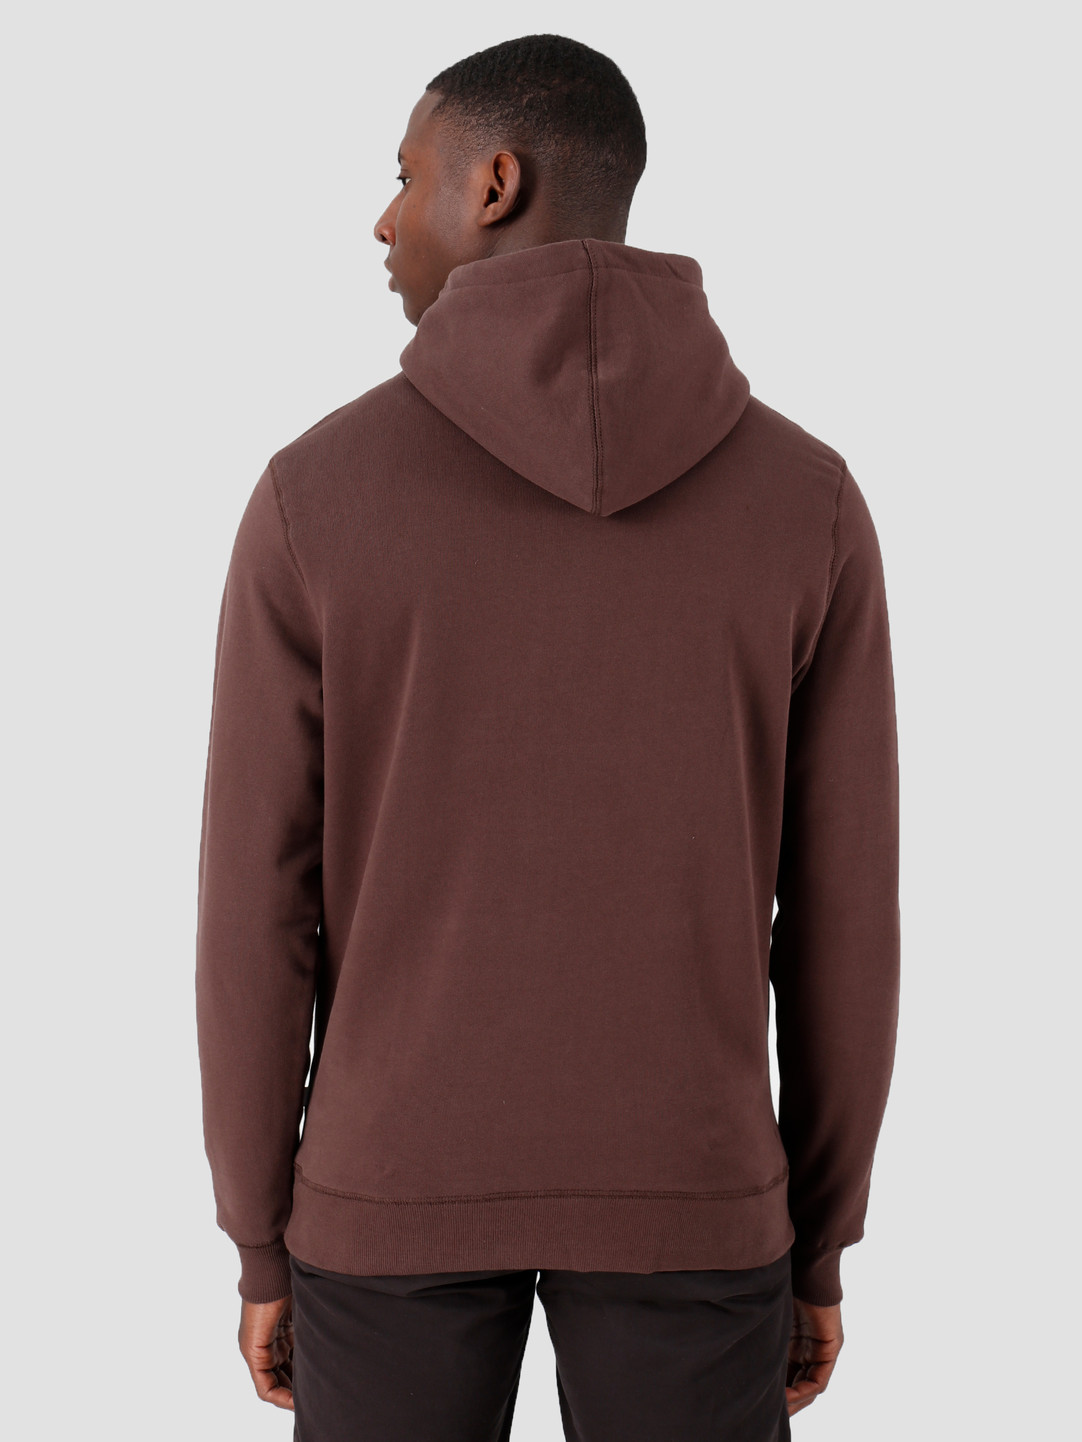 Quality Blanks Quality Blanks QB93 Patch Logo Hoodie Chocolat Brown